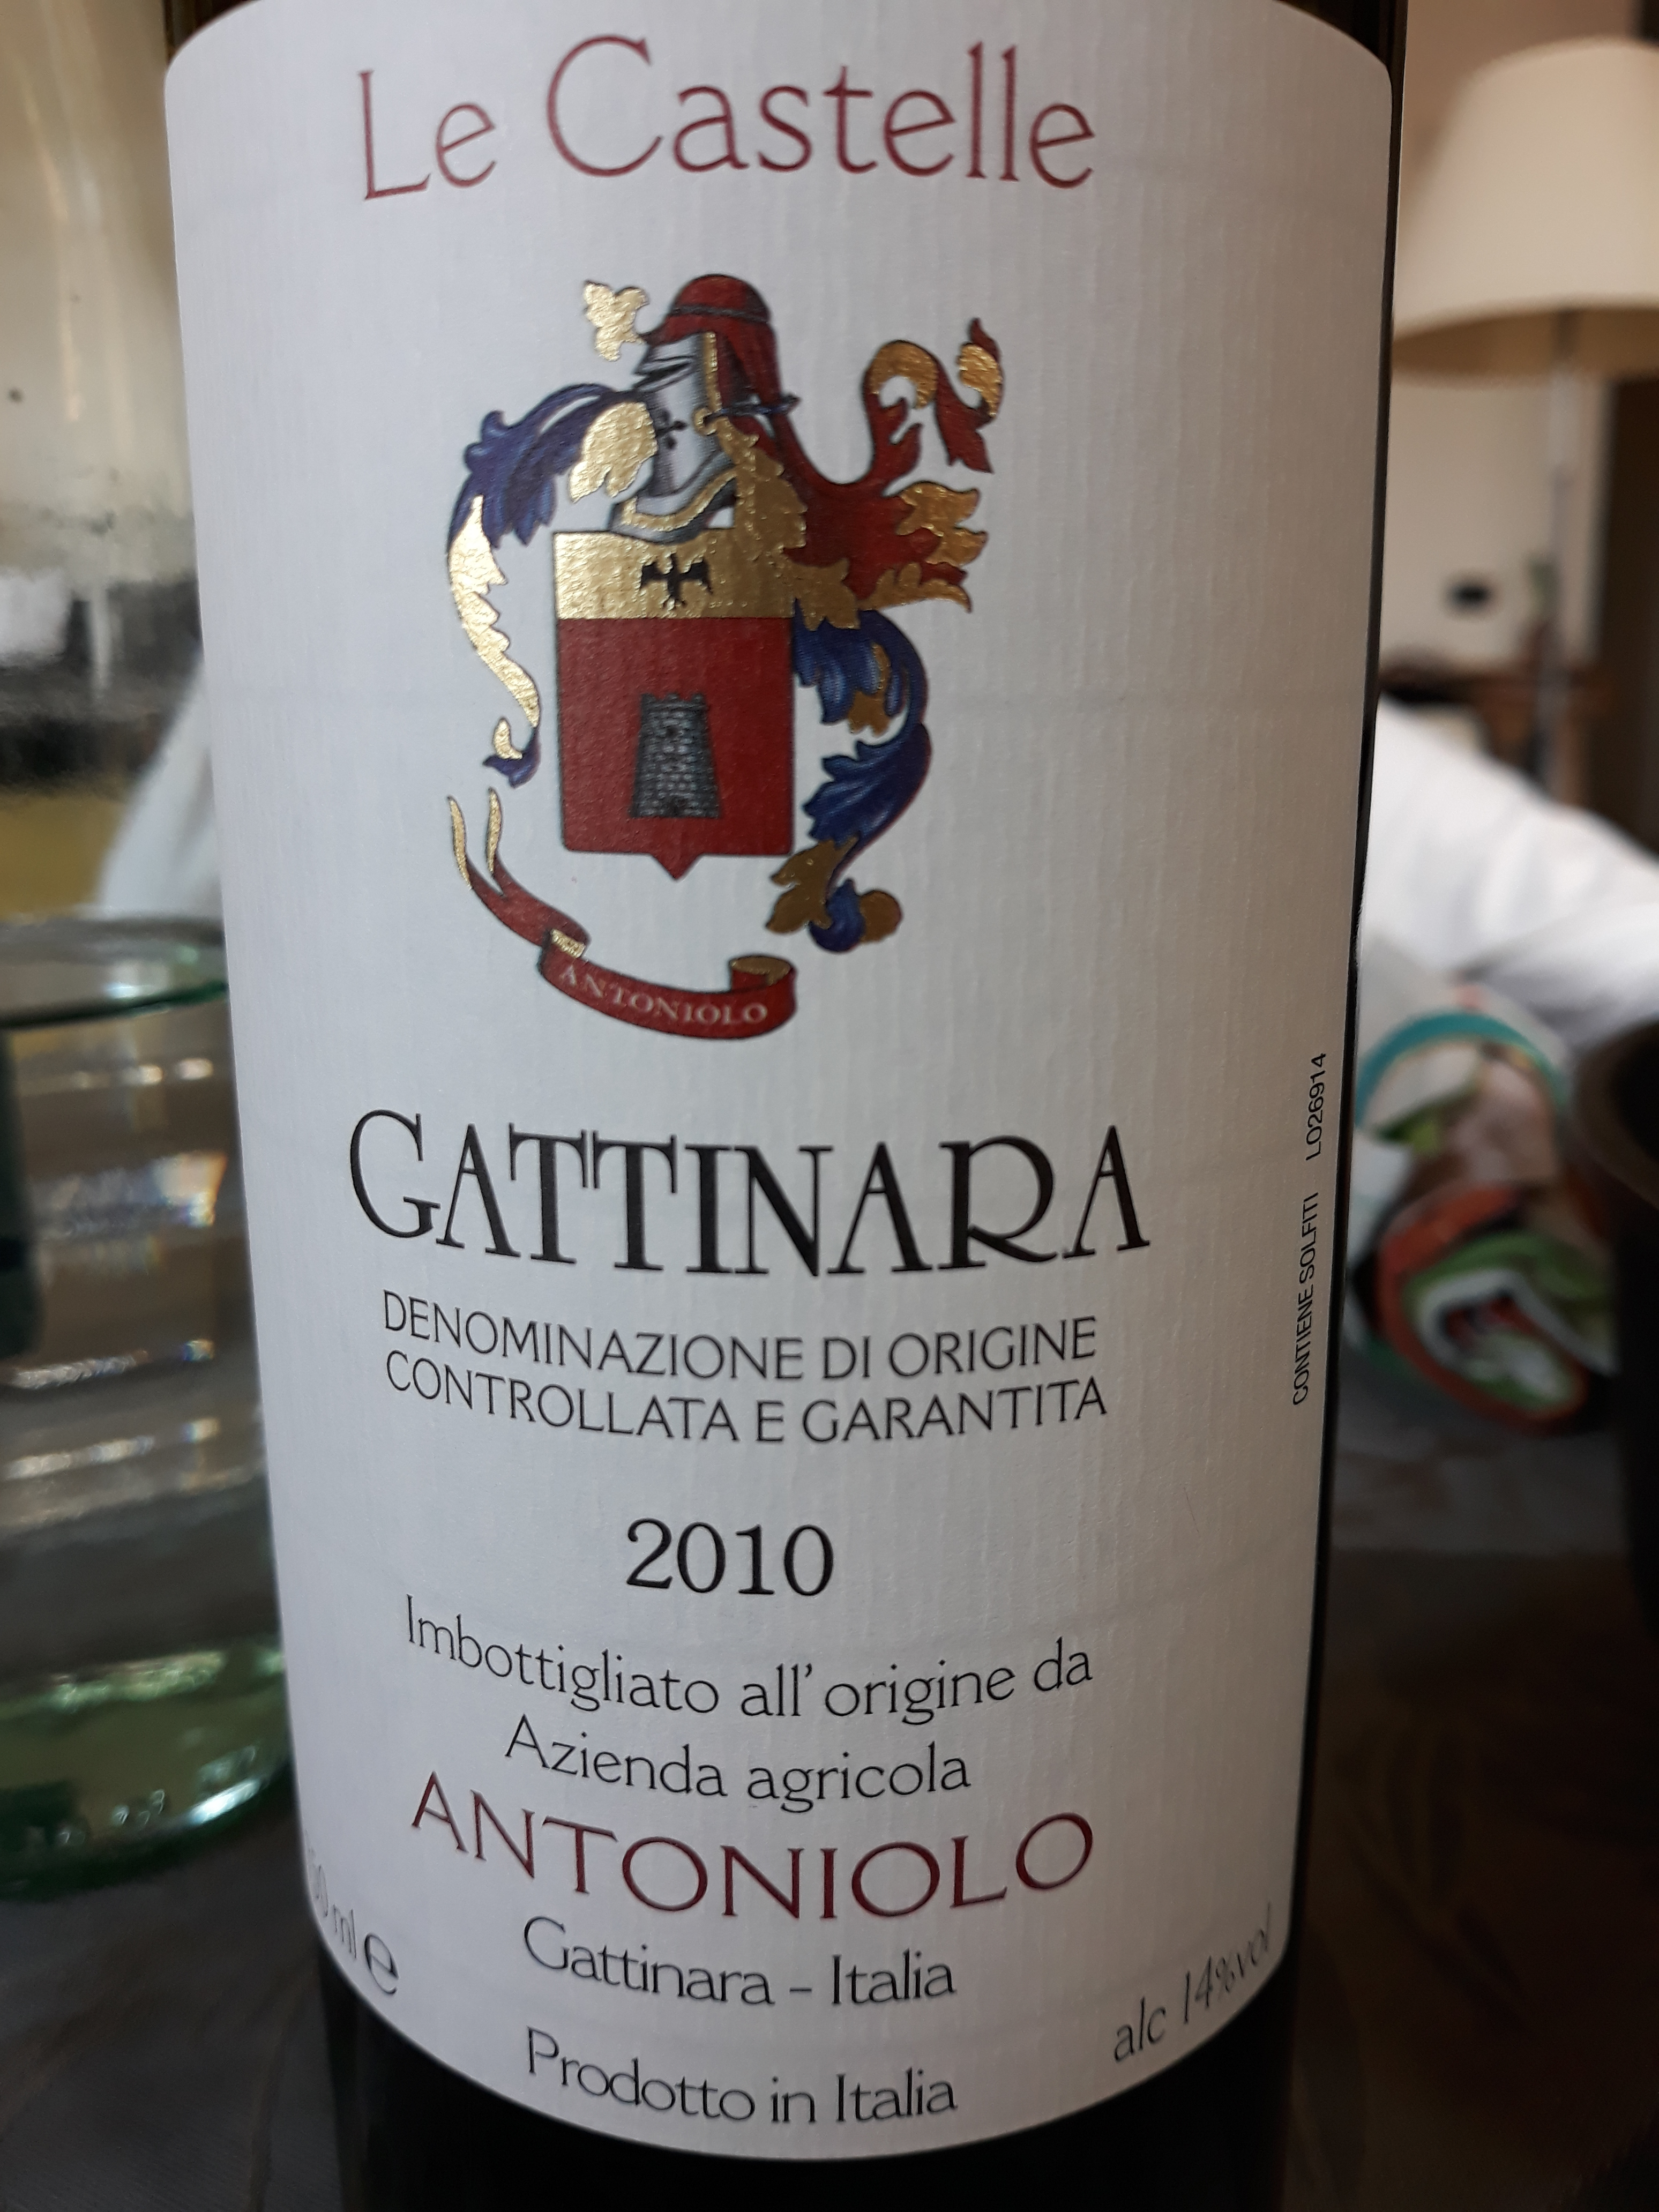 Gattinara Le Castelle 2010 - Antoniolo